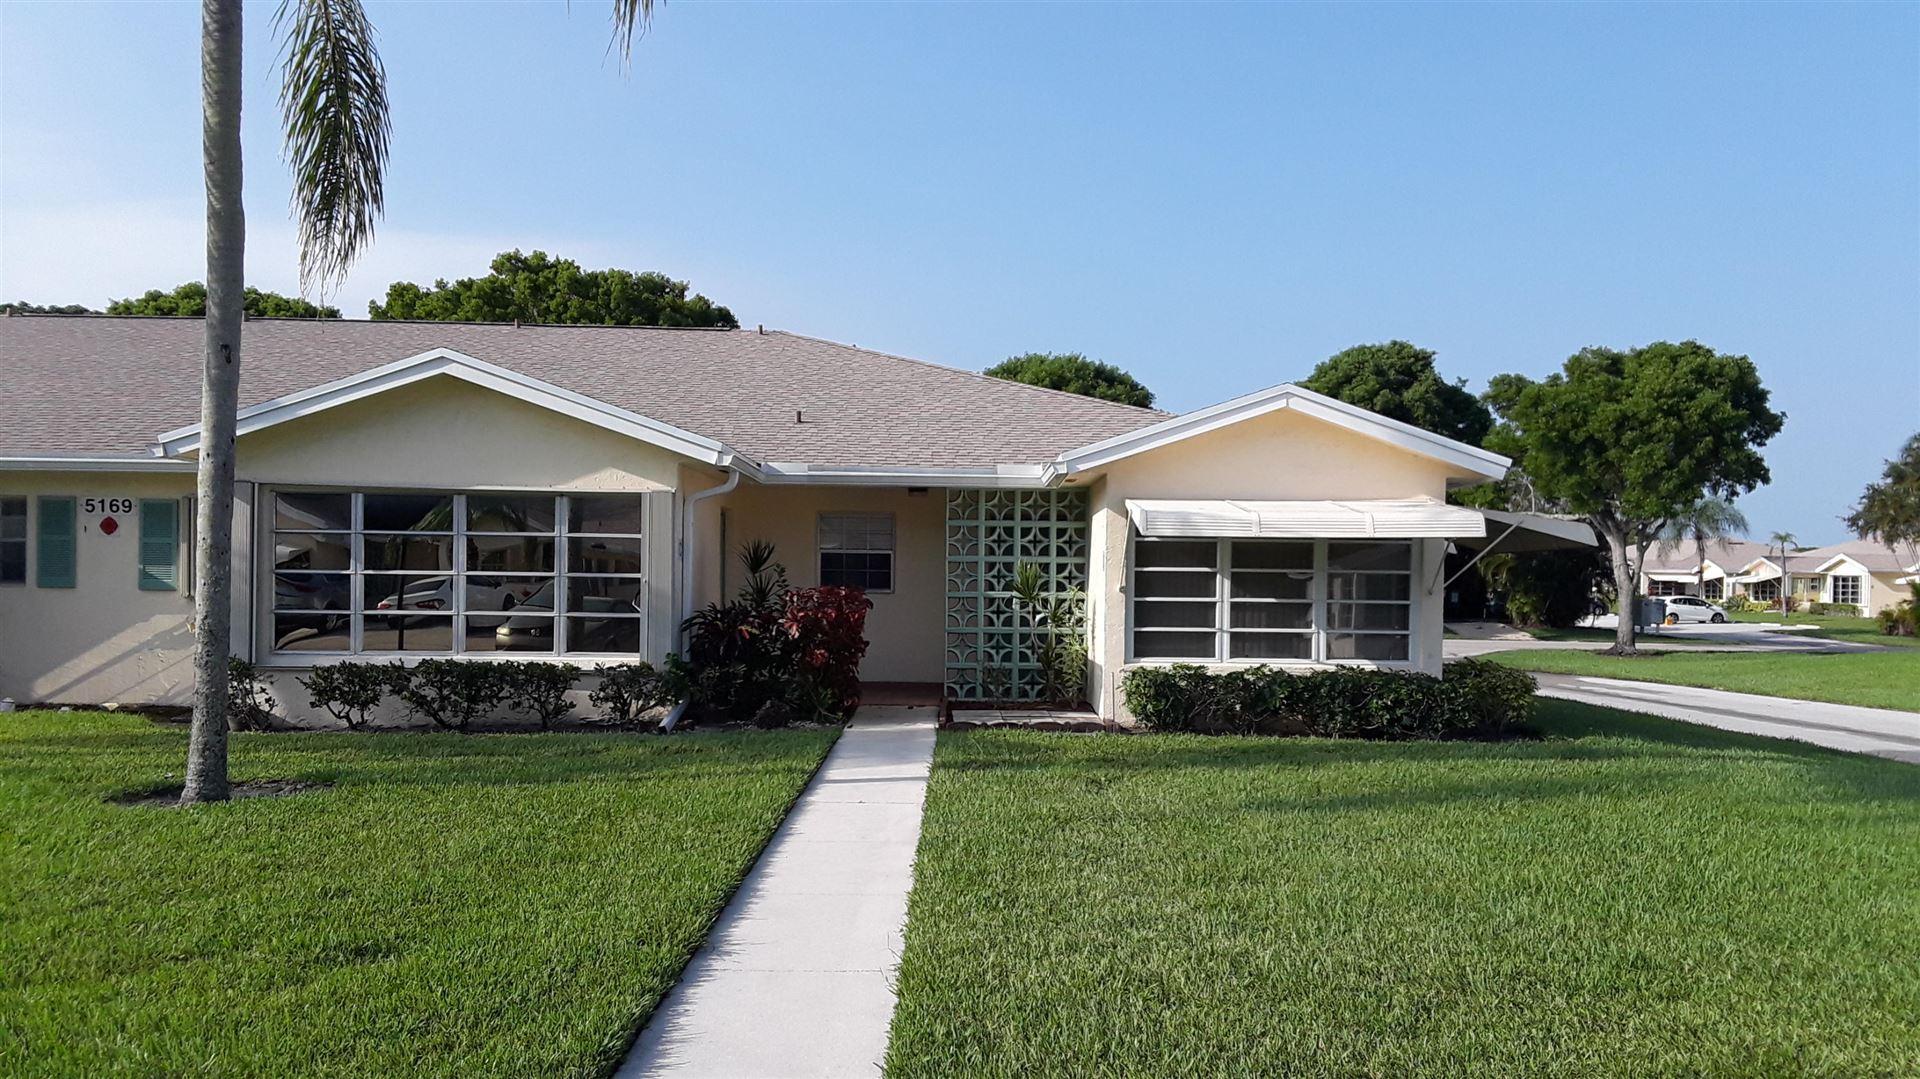 5169 Lakefront Boulevard #D, Delray Beach, FL 33484 - #: RX-10625517